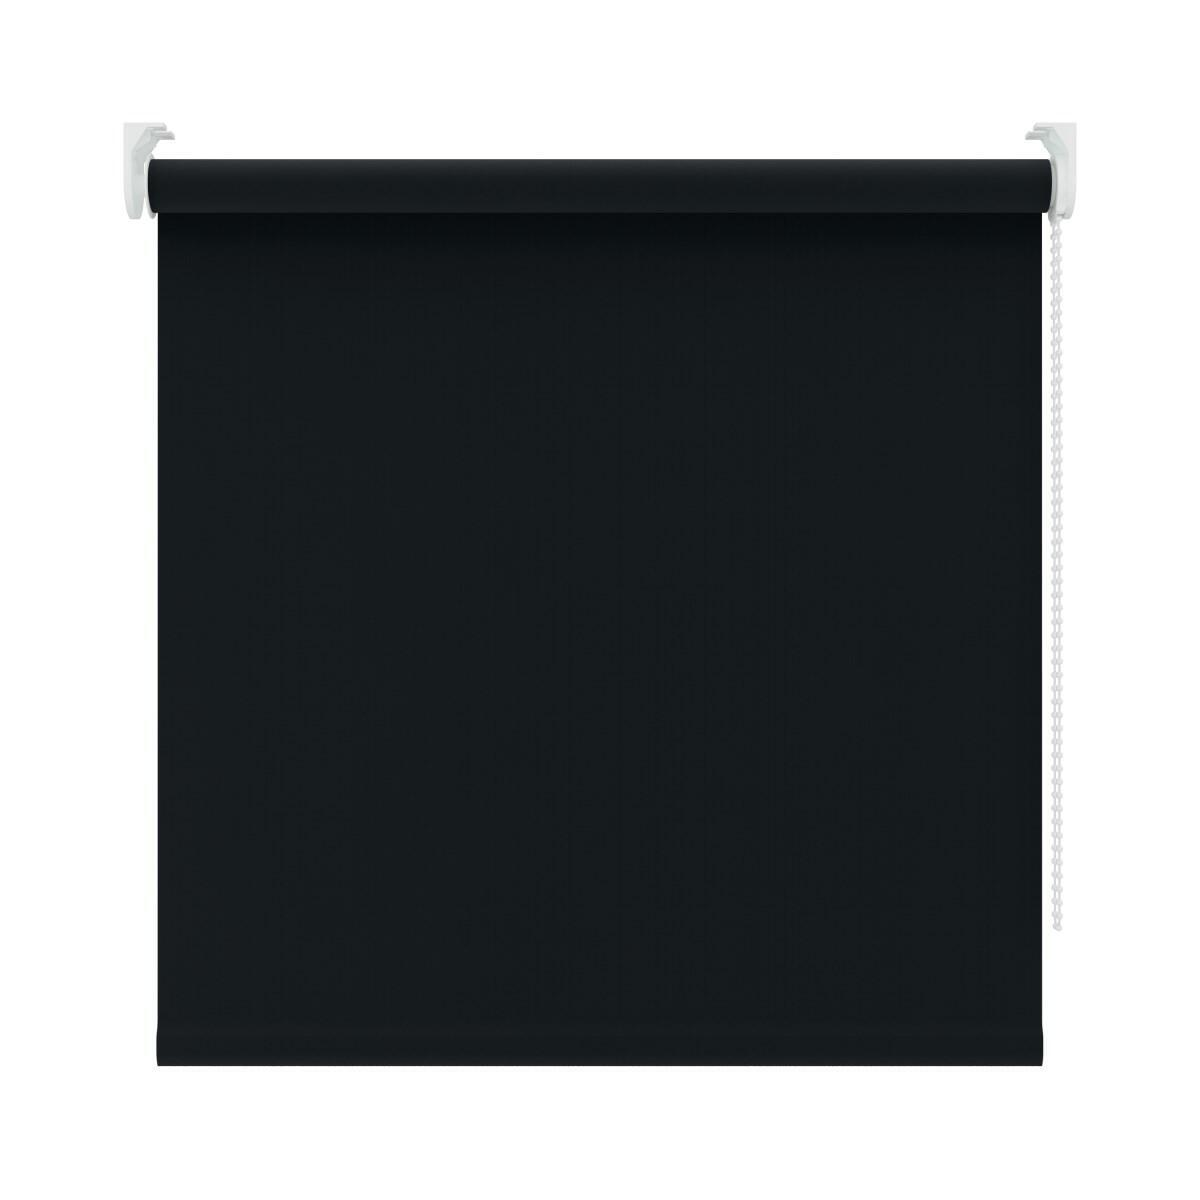 Tenda a rullo oscurante Dublin nero 60 x 190 cm - 3